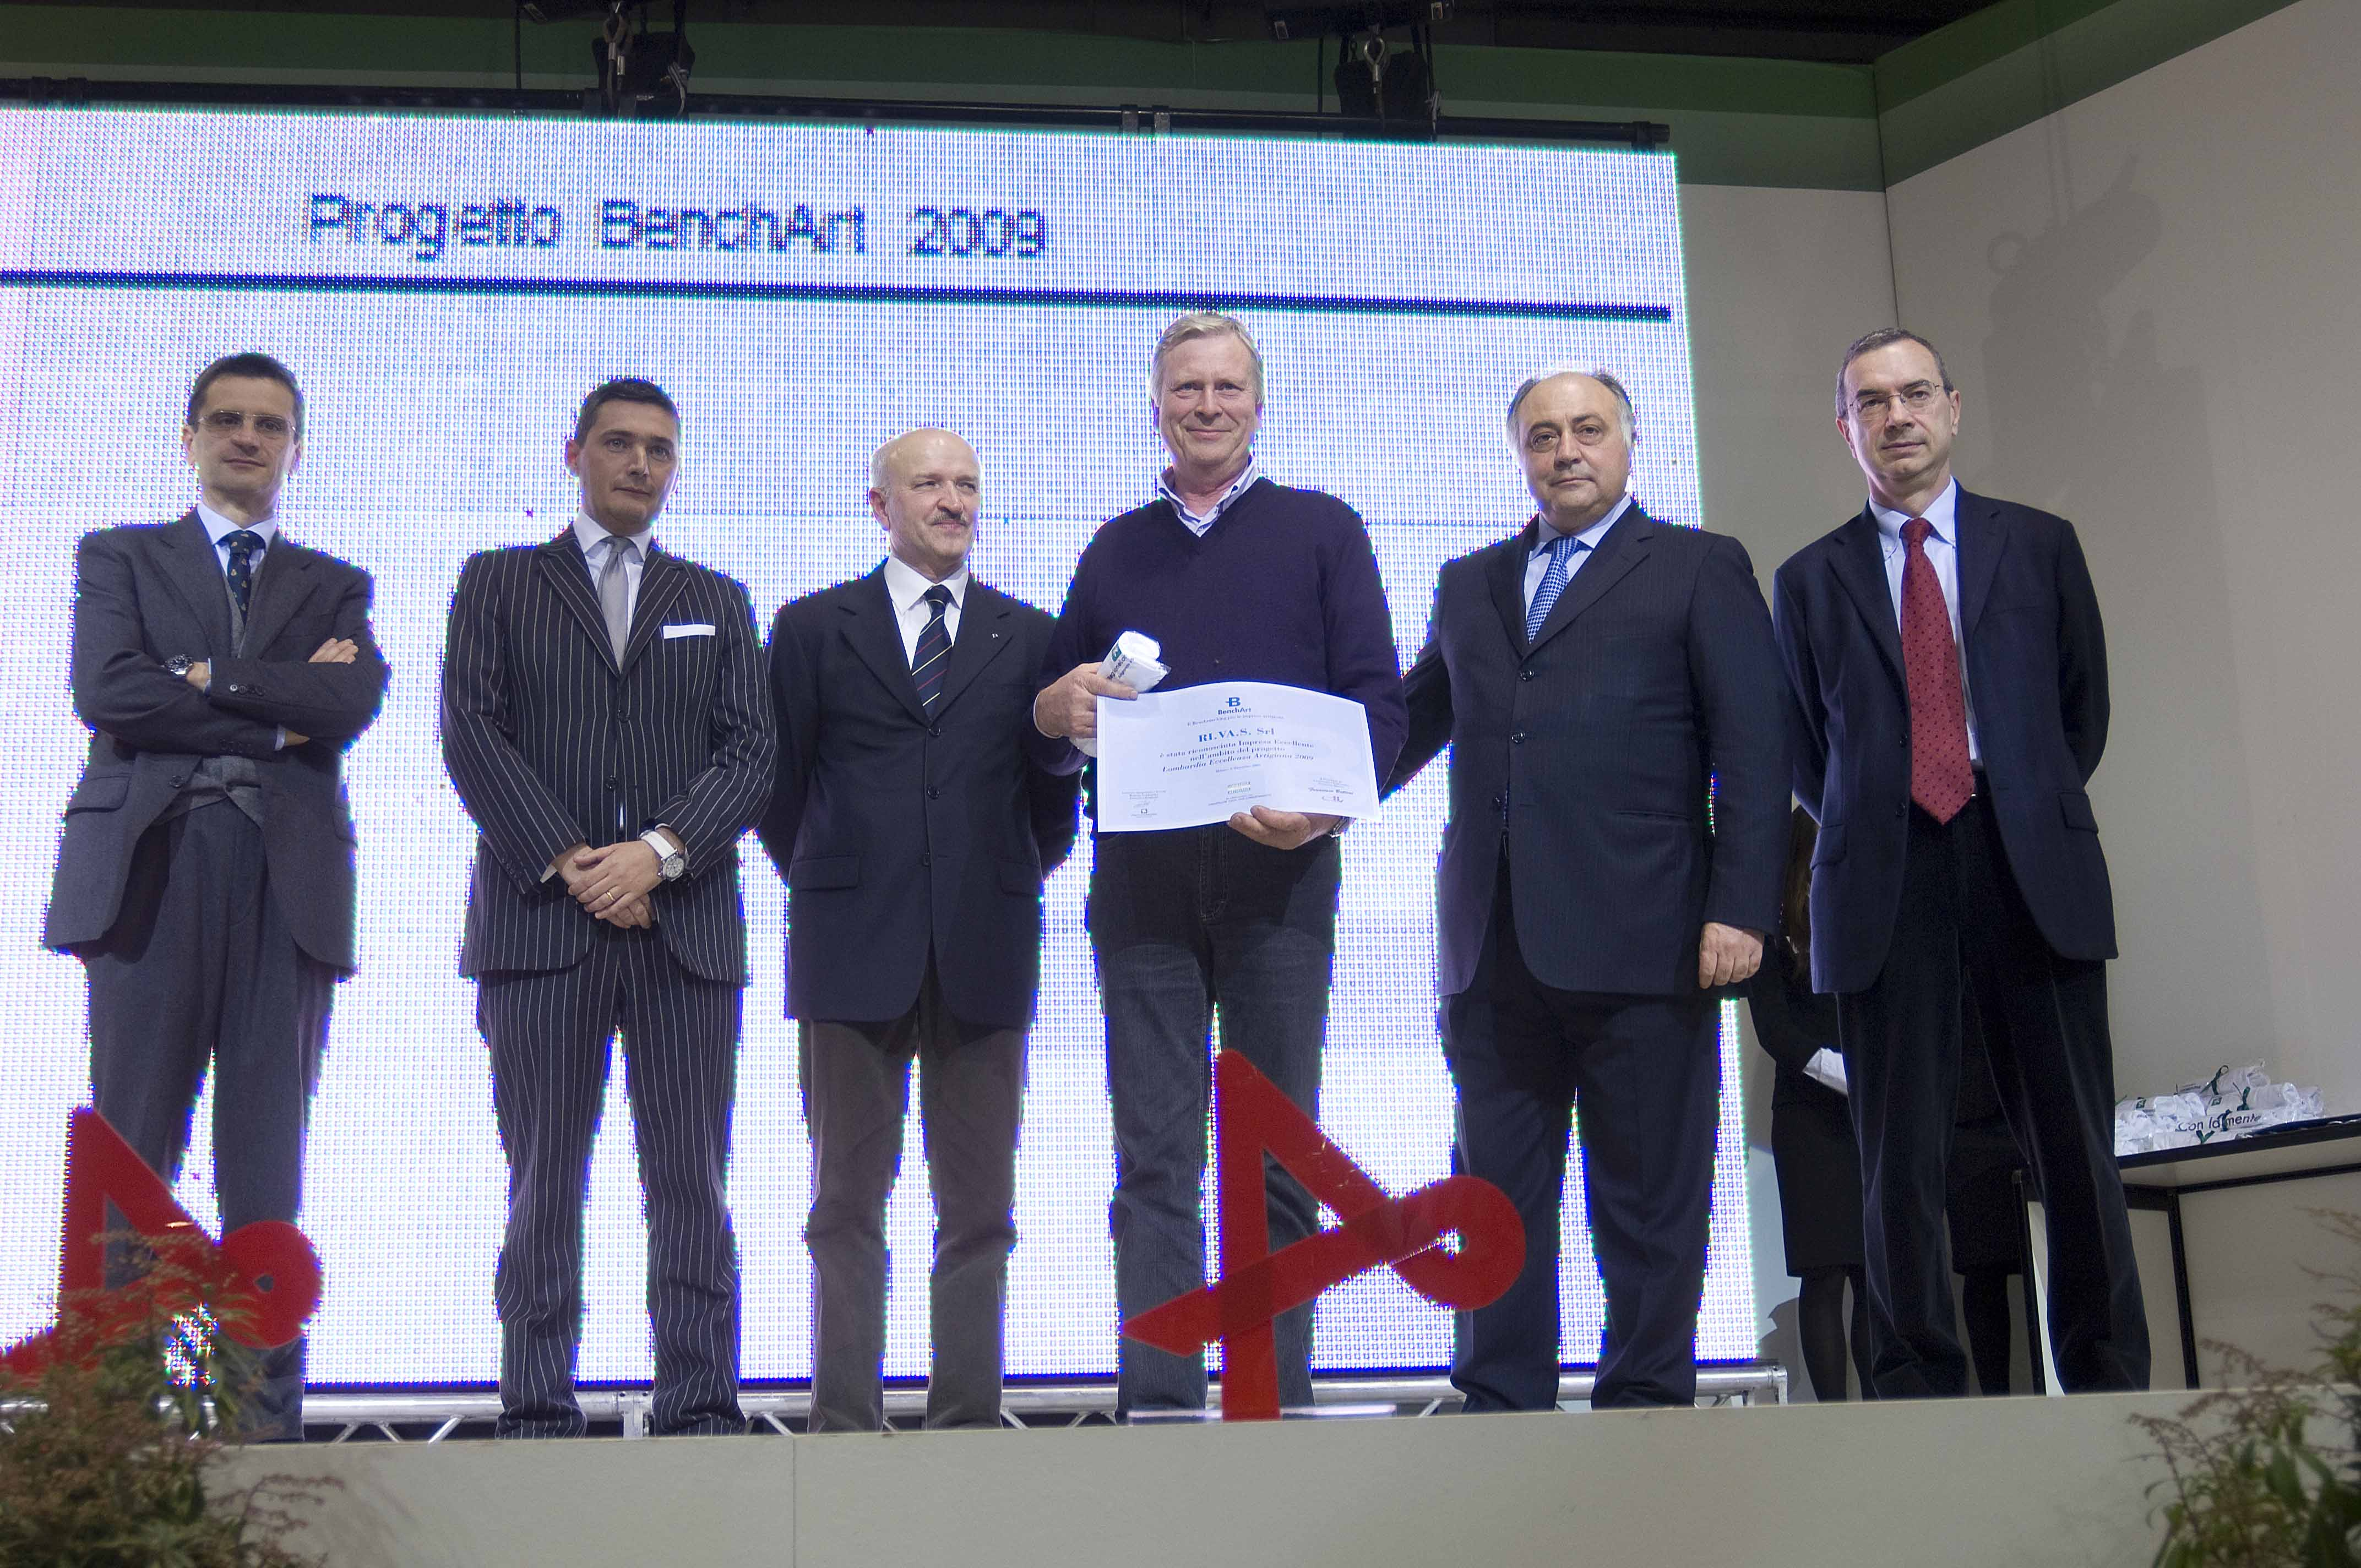 Premio eccellenza artigiana a RIVAS